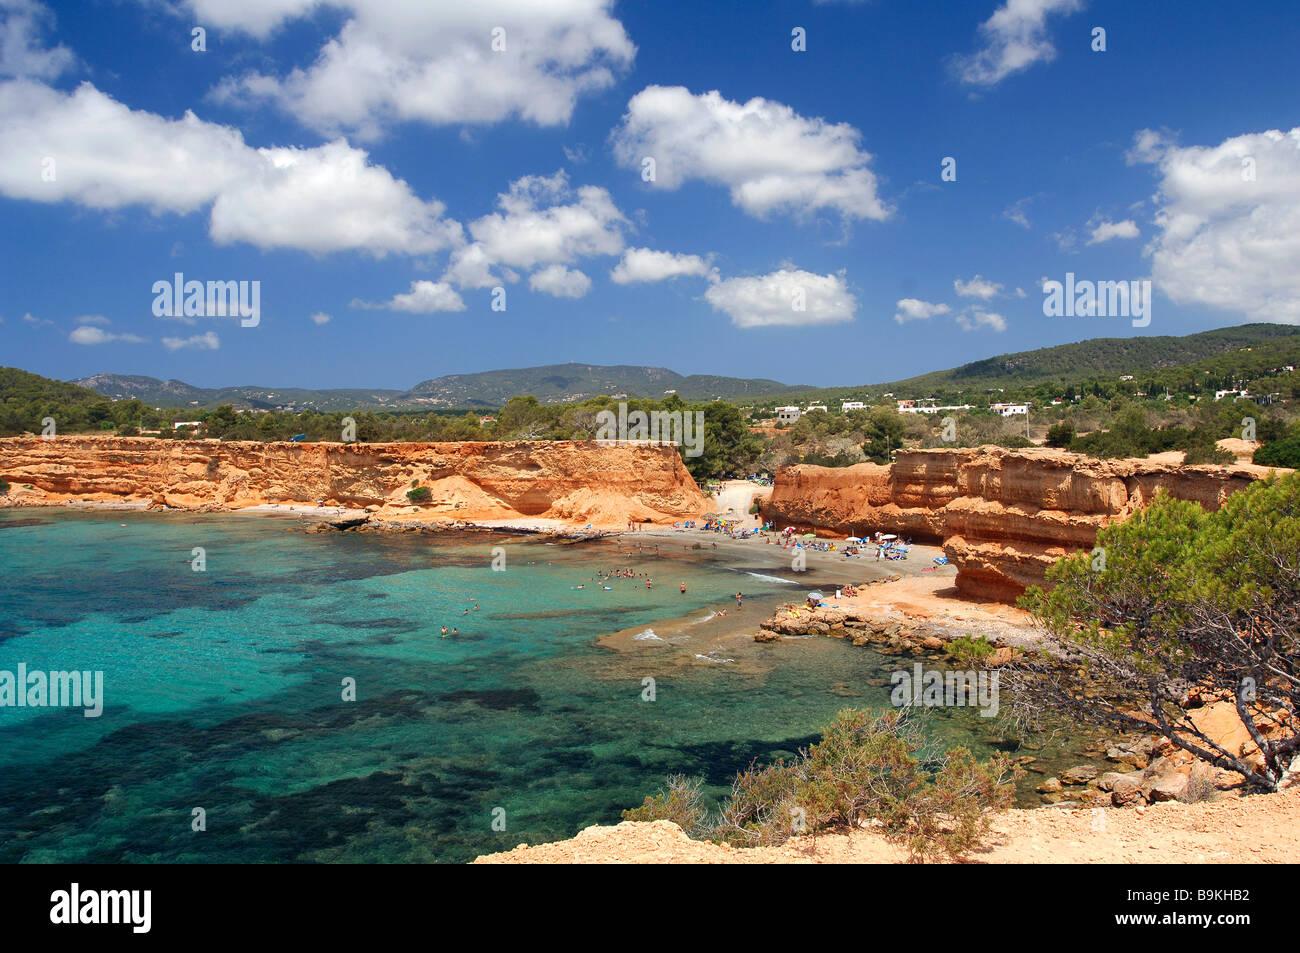 Spain, Balearic Islands, Ibiza, Cala Sa Caleta - Stock Image